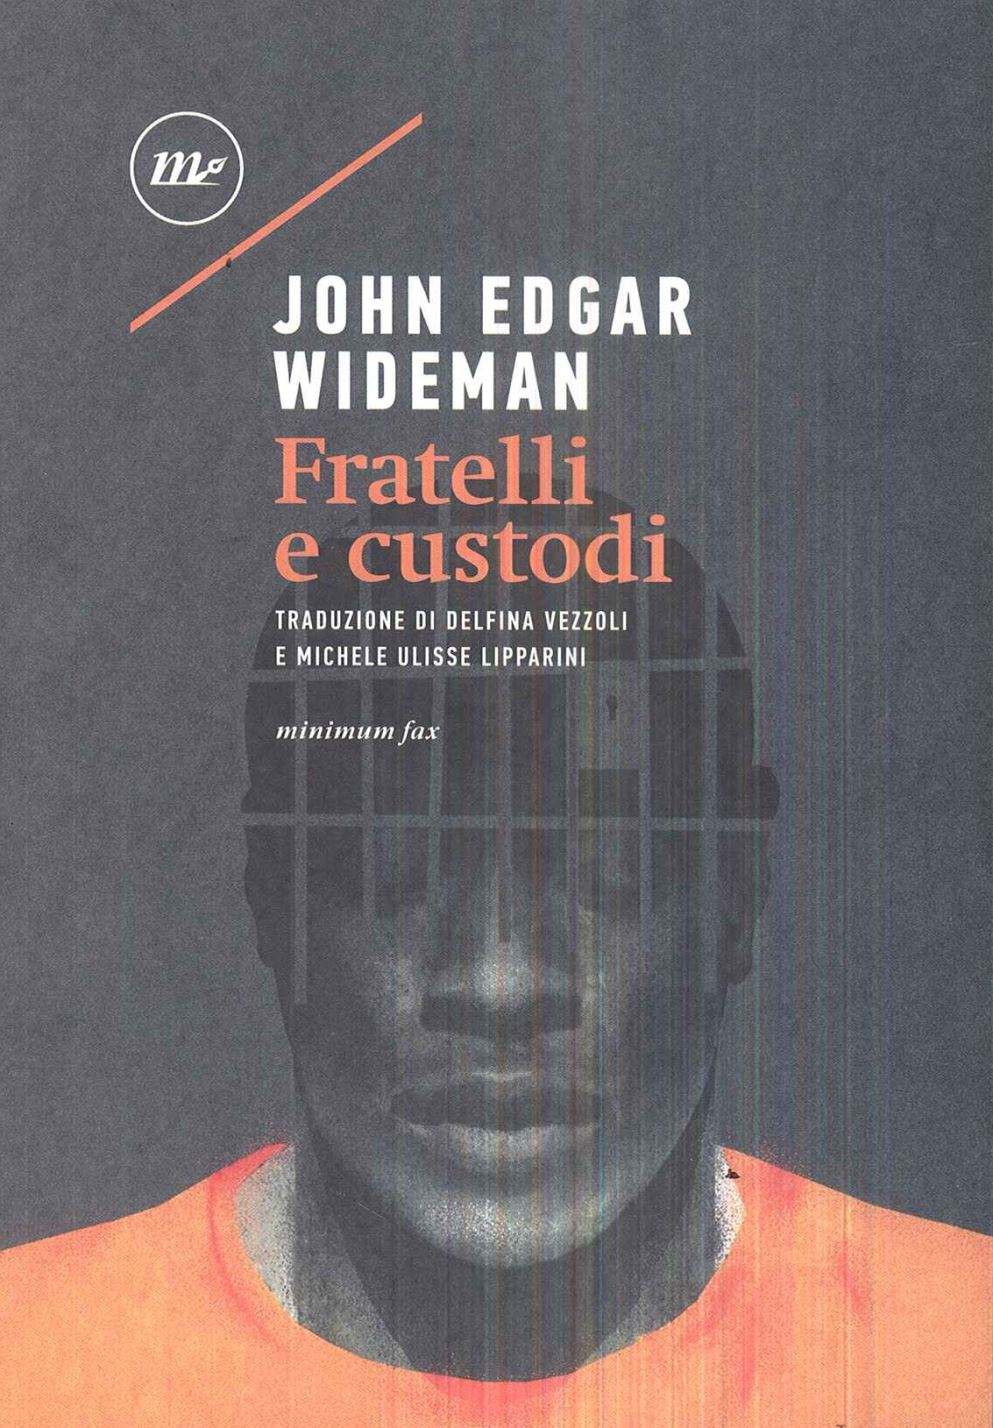 John Edgar Wideman – Fratelli e custodi